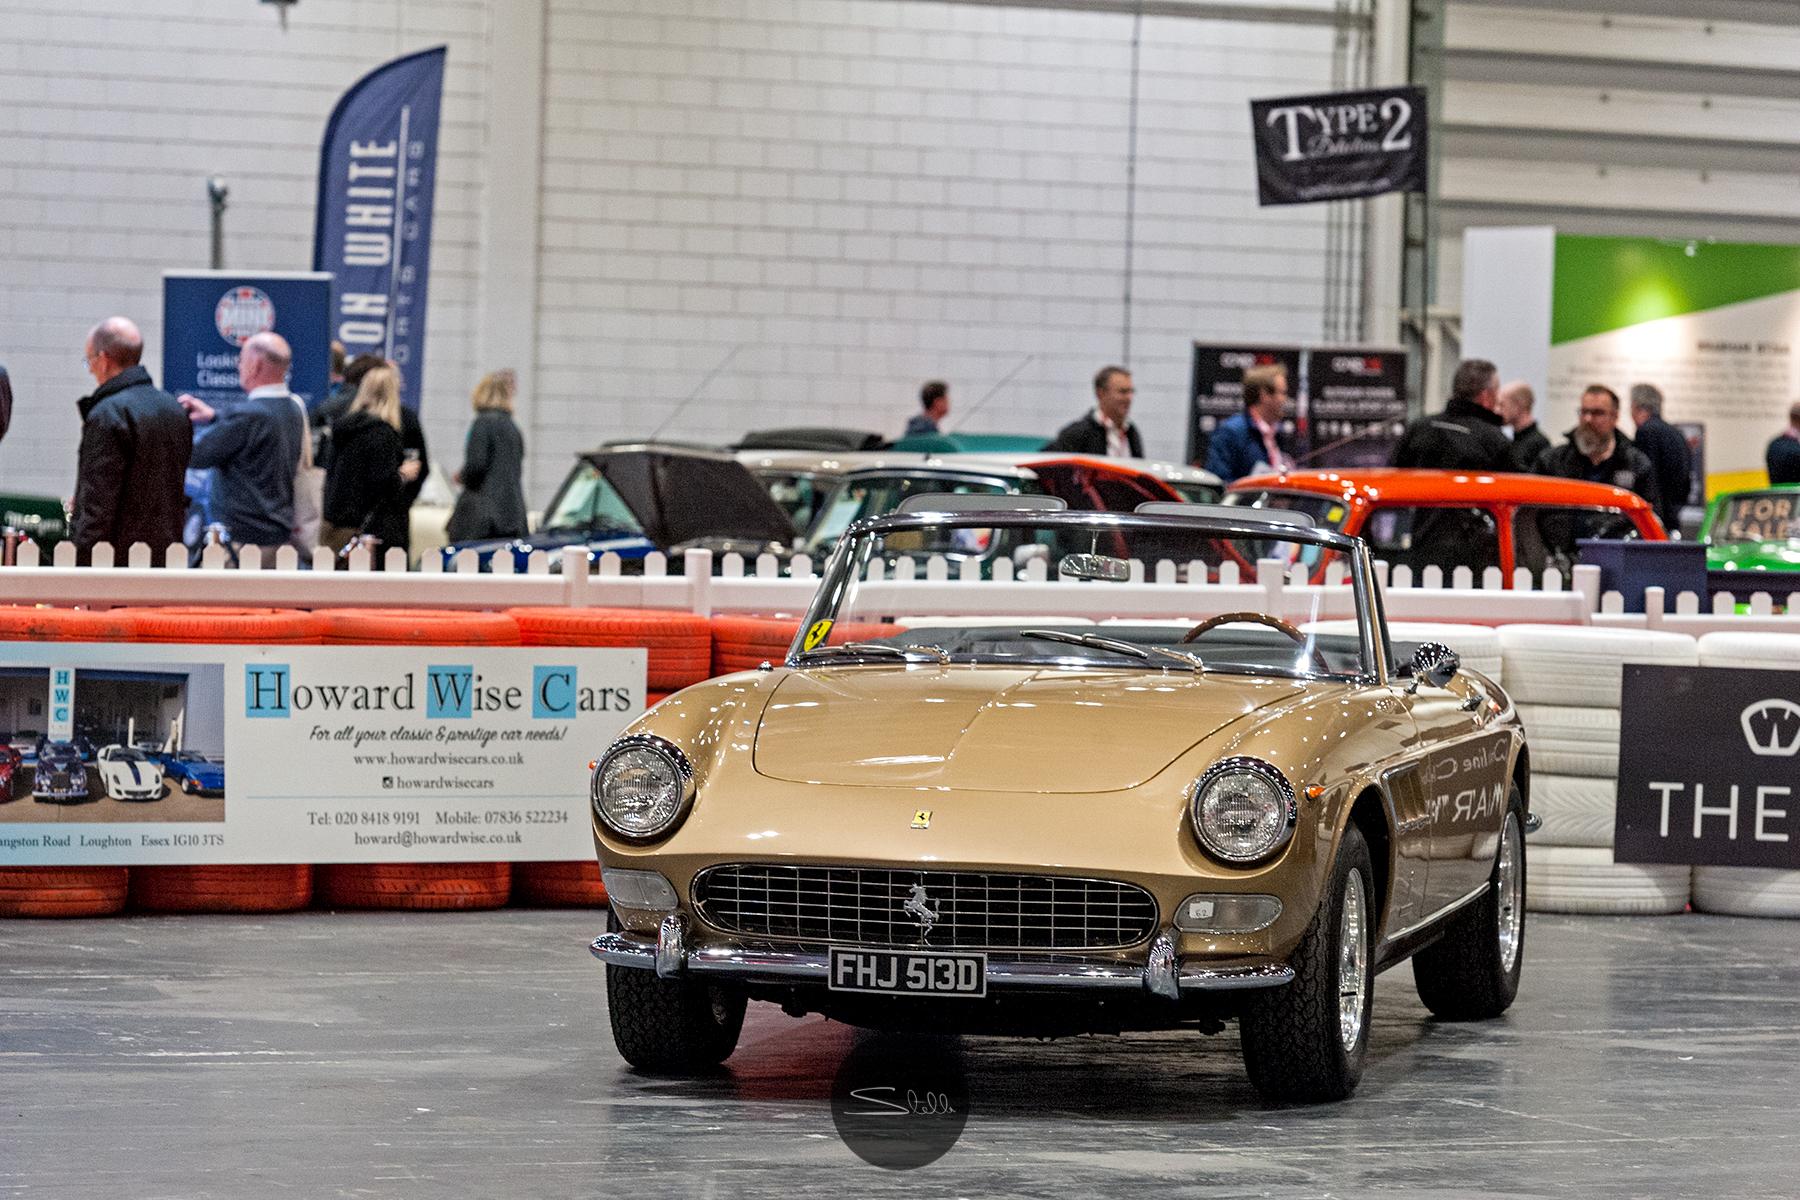 Stella Scordellis London Classic Car Show 2017 40 Watermarked.jpg